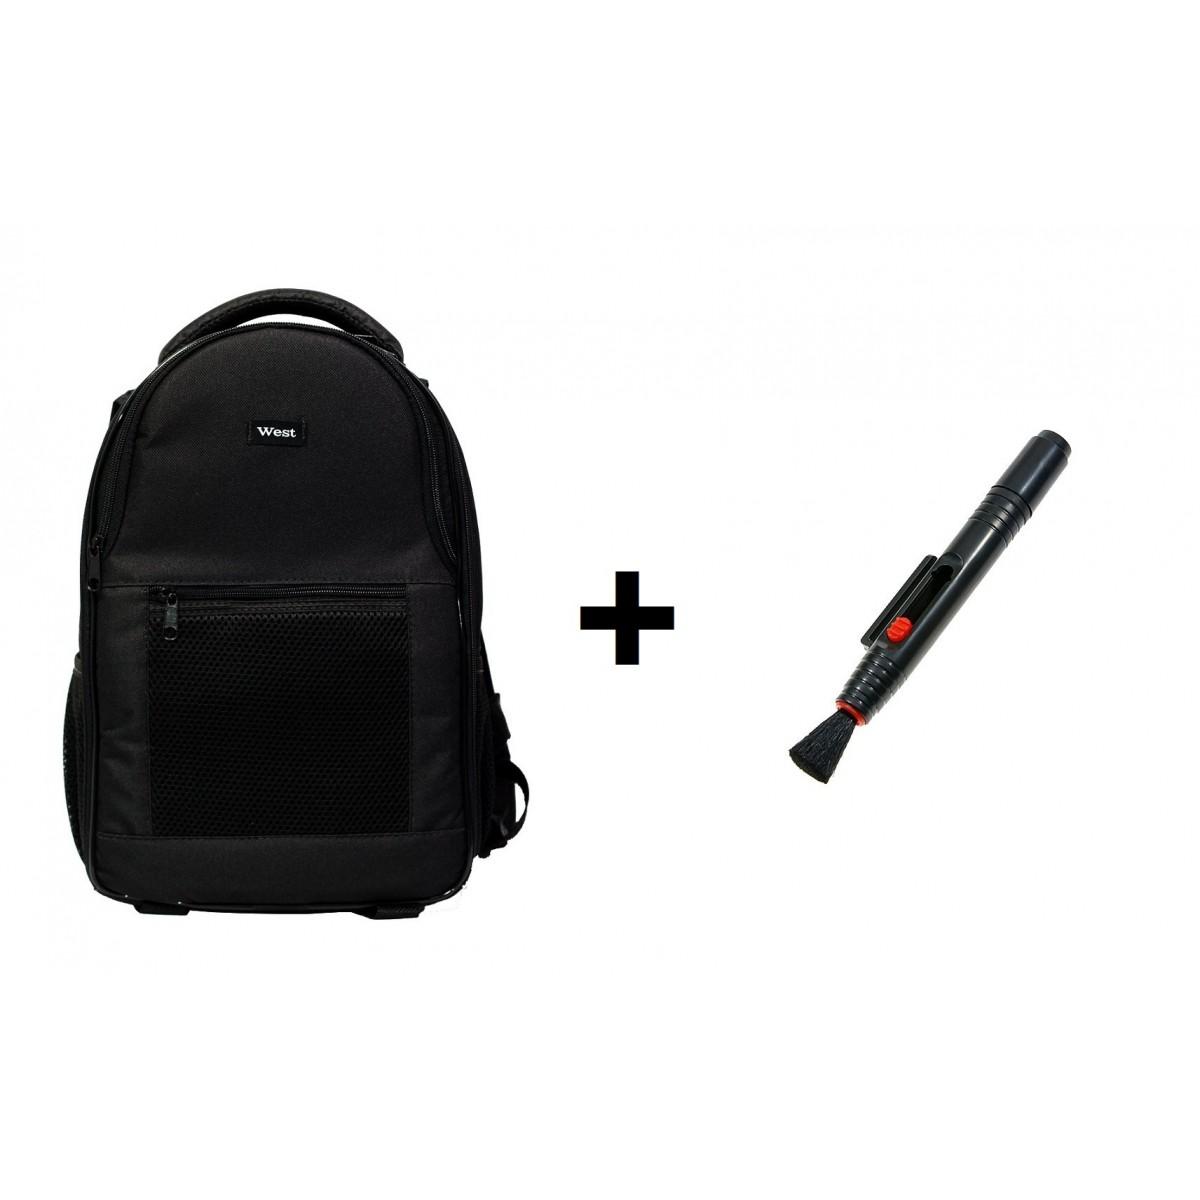 Kit Mochila Para Câmera Fotográfica Jamily E Acessórios + Caneta De Limpeza Lenspen Para Limpeza